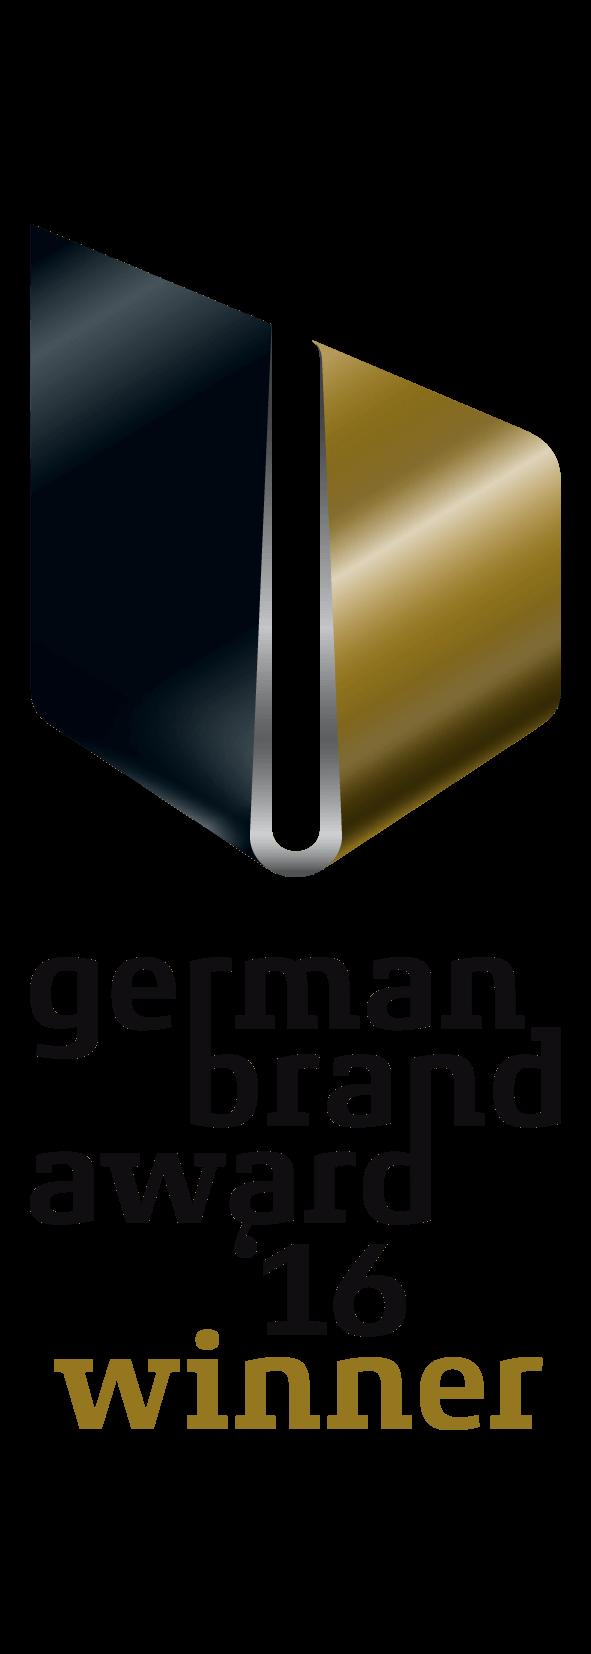 German brand award 2016 winner